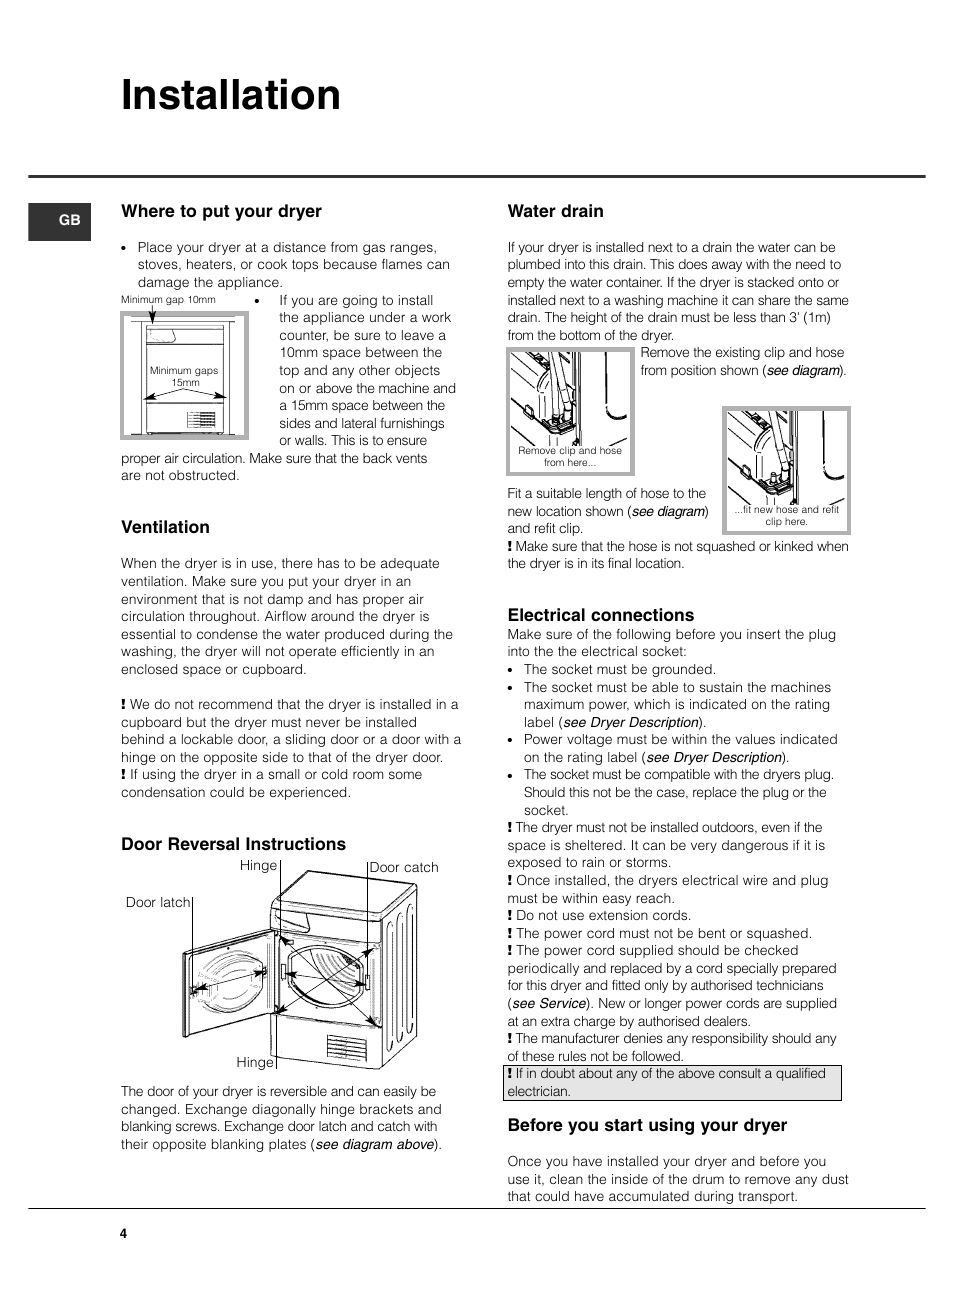 Installation Where To Put Your Dryer Ventilation Hotpoint Tcm570 Ariston Washing Machine Wiring Diagram User Manual Page 4 16